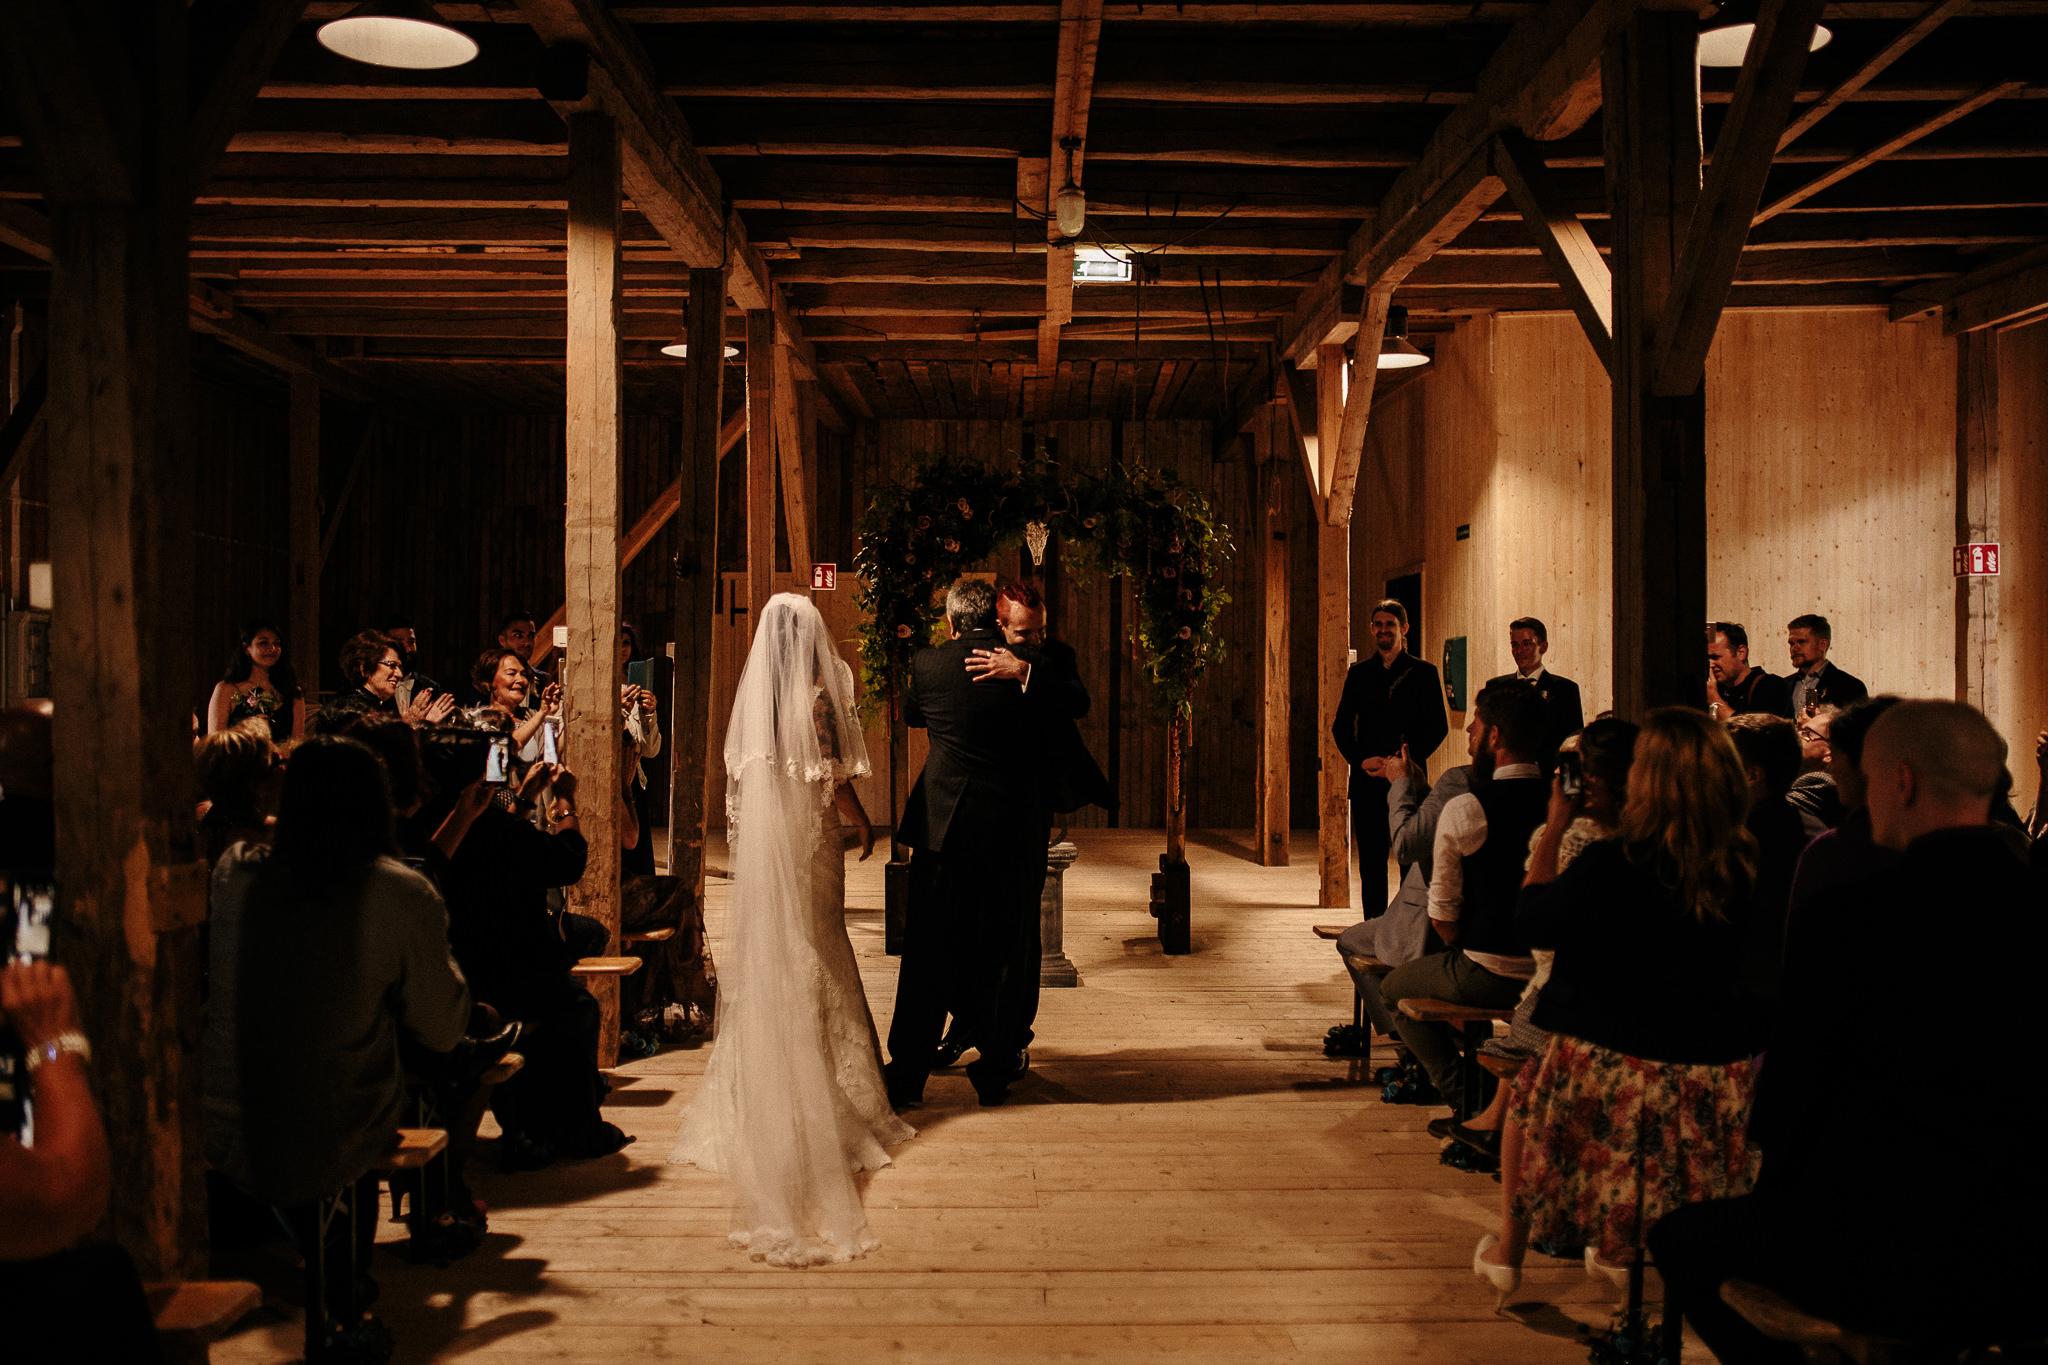 Ceren & Jani - Finland Wedding Photographer - Weddings by Qay - Wedding Photographer (94 of 166).jpg